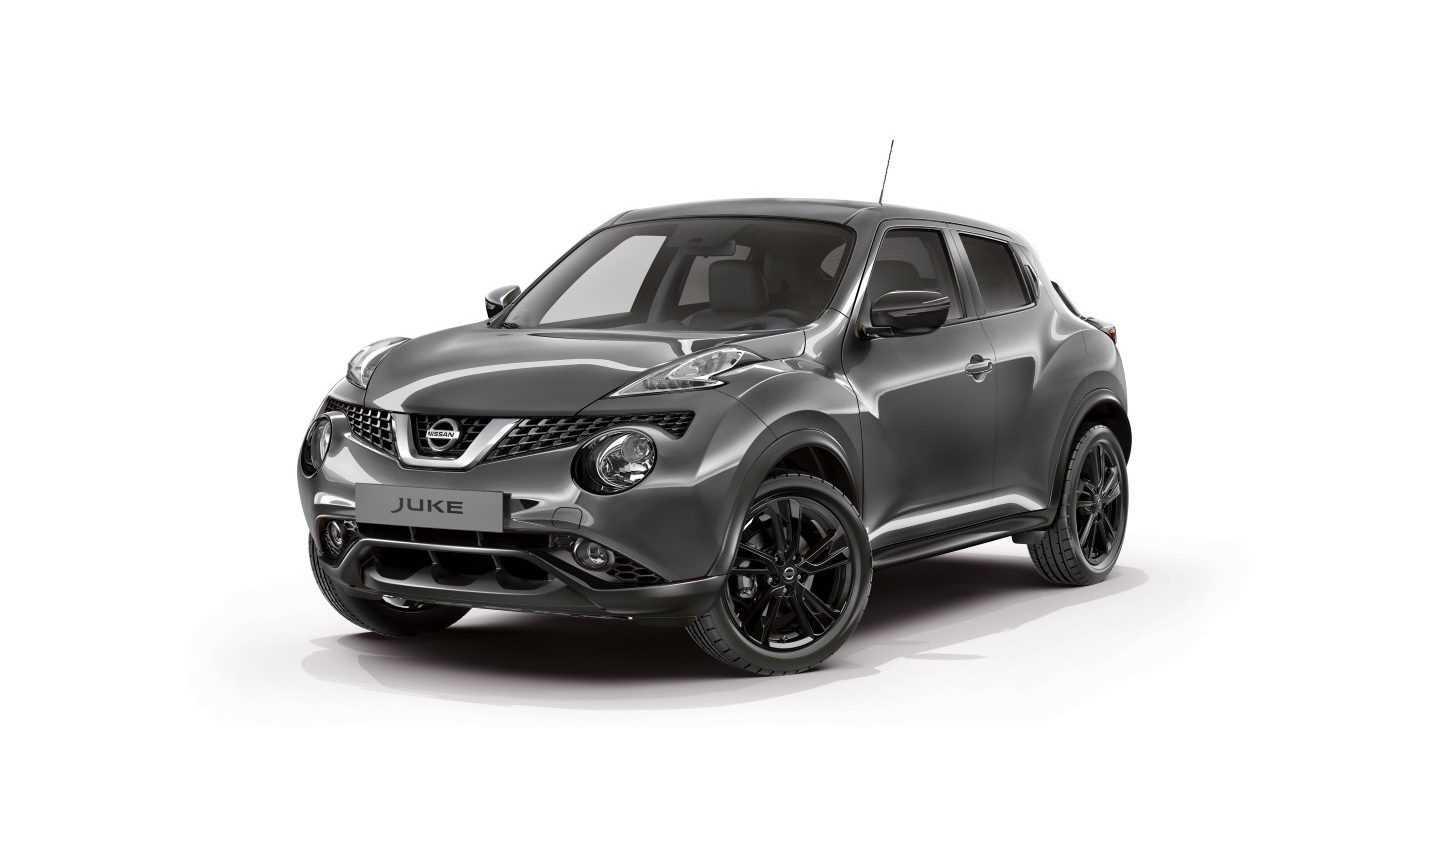 Nissan Juke Premium Edition 2017